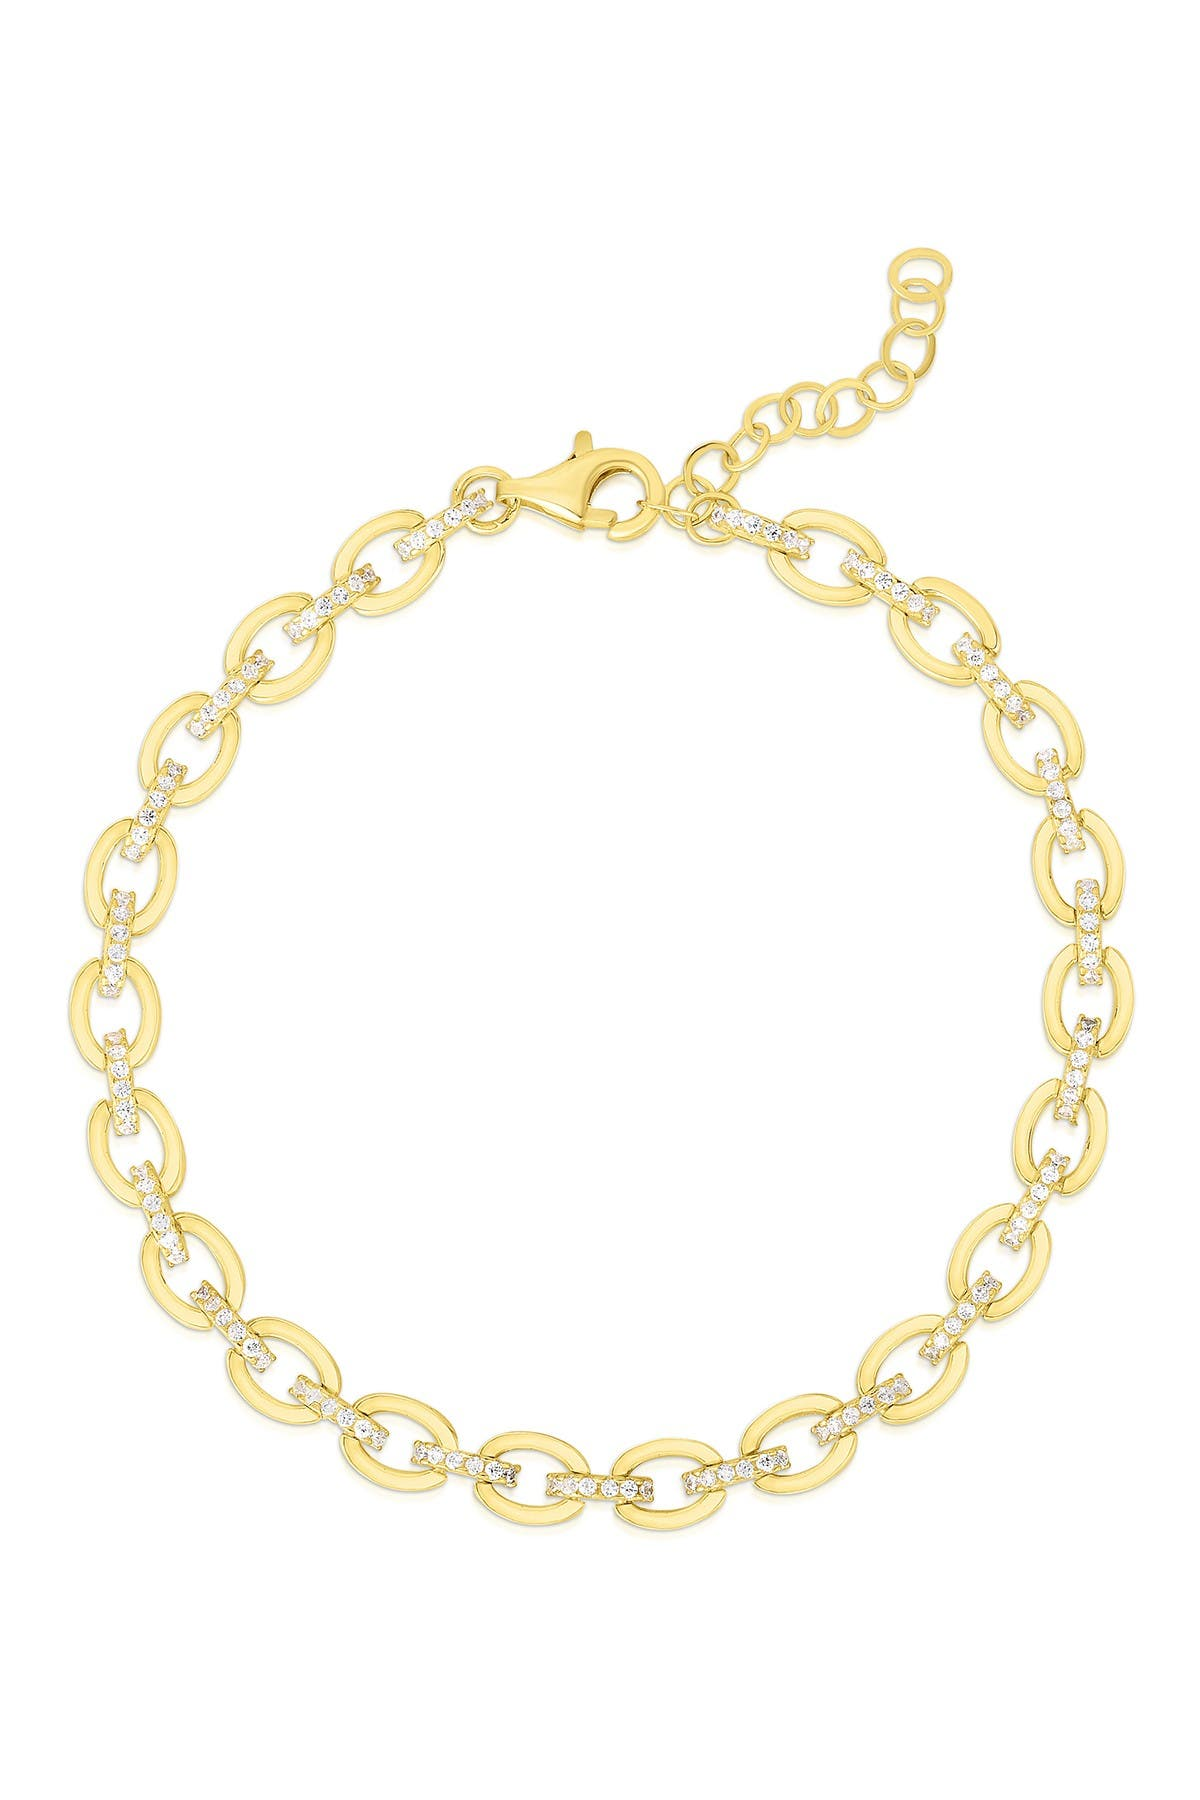 Image of Sphera Milano Gold Vermeil Link Bracelet